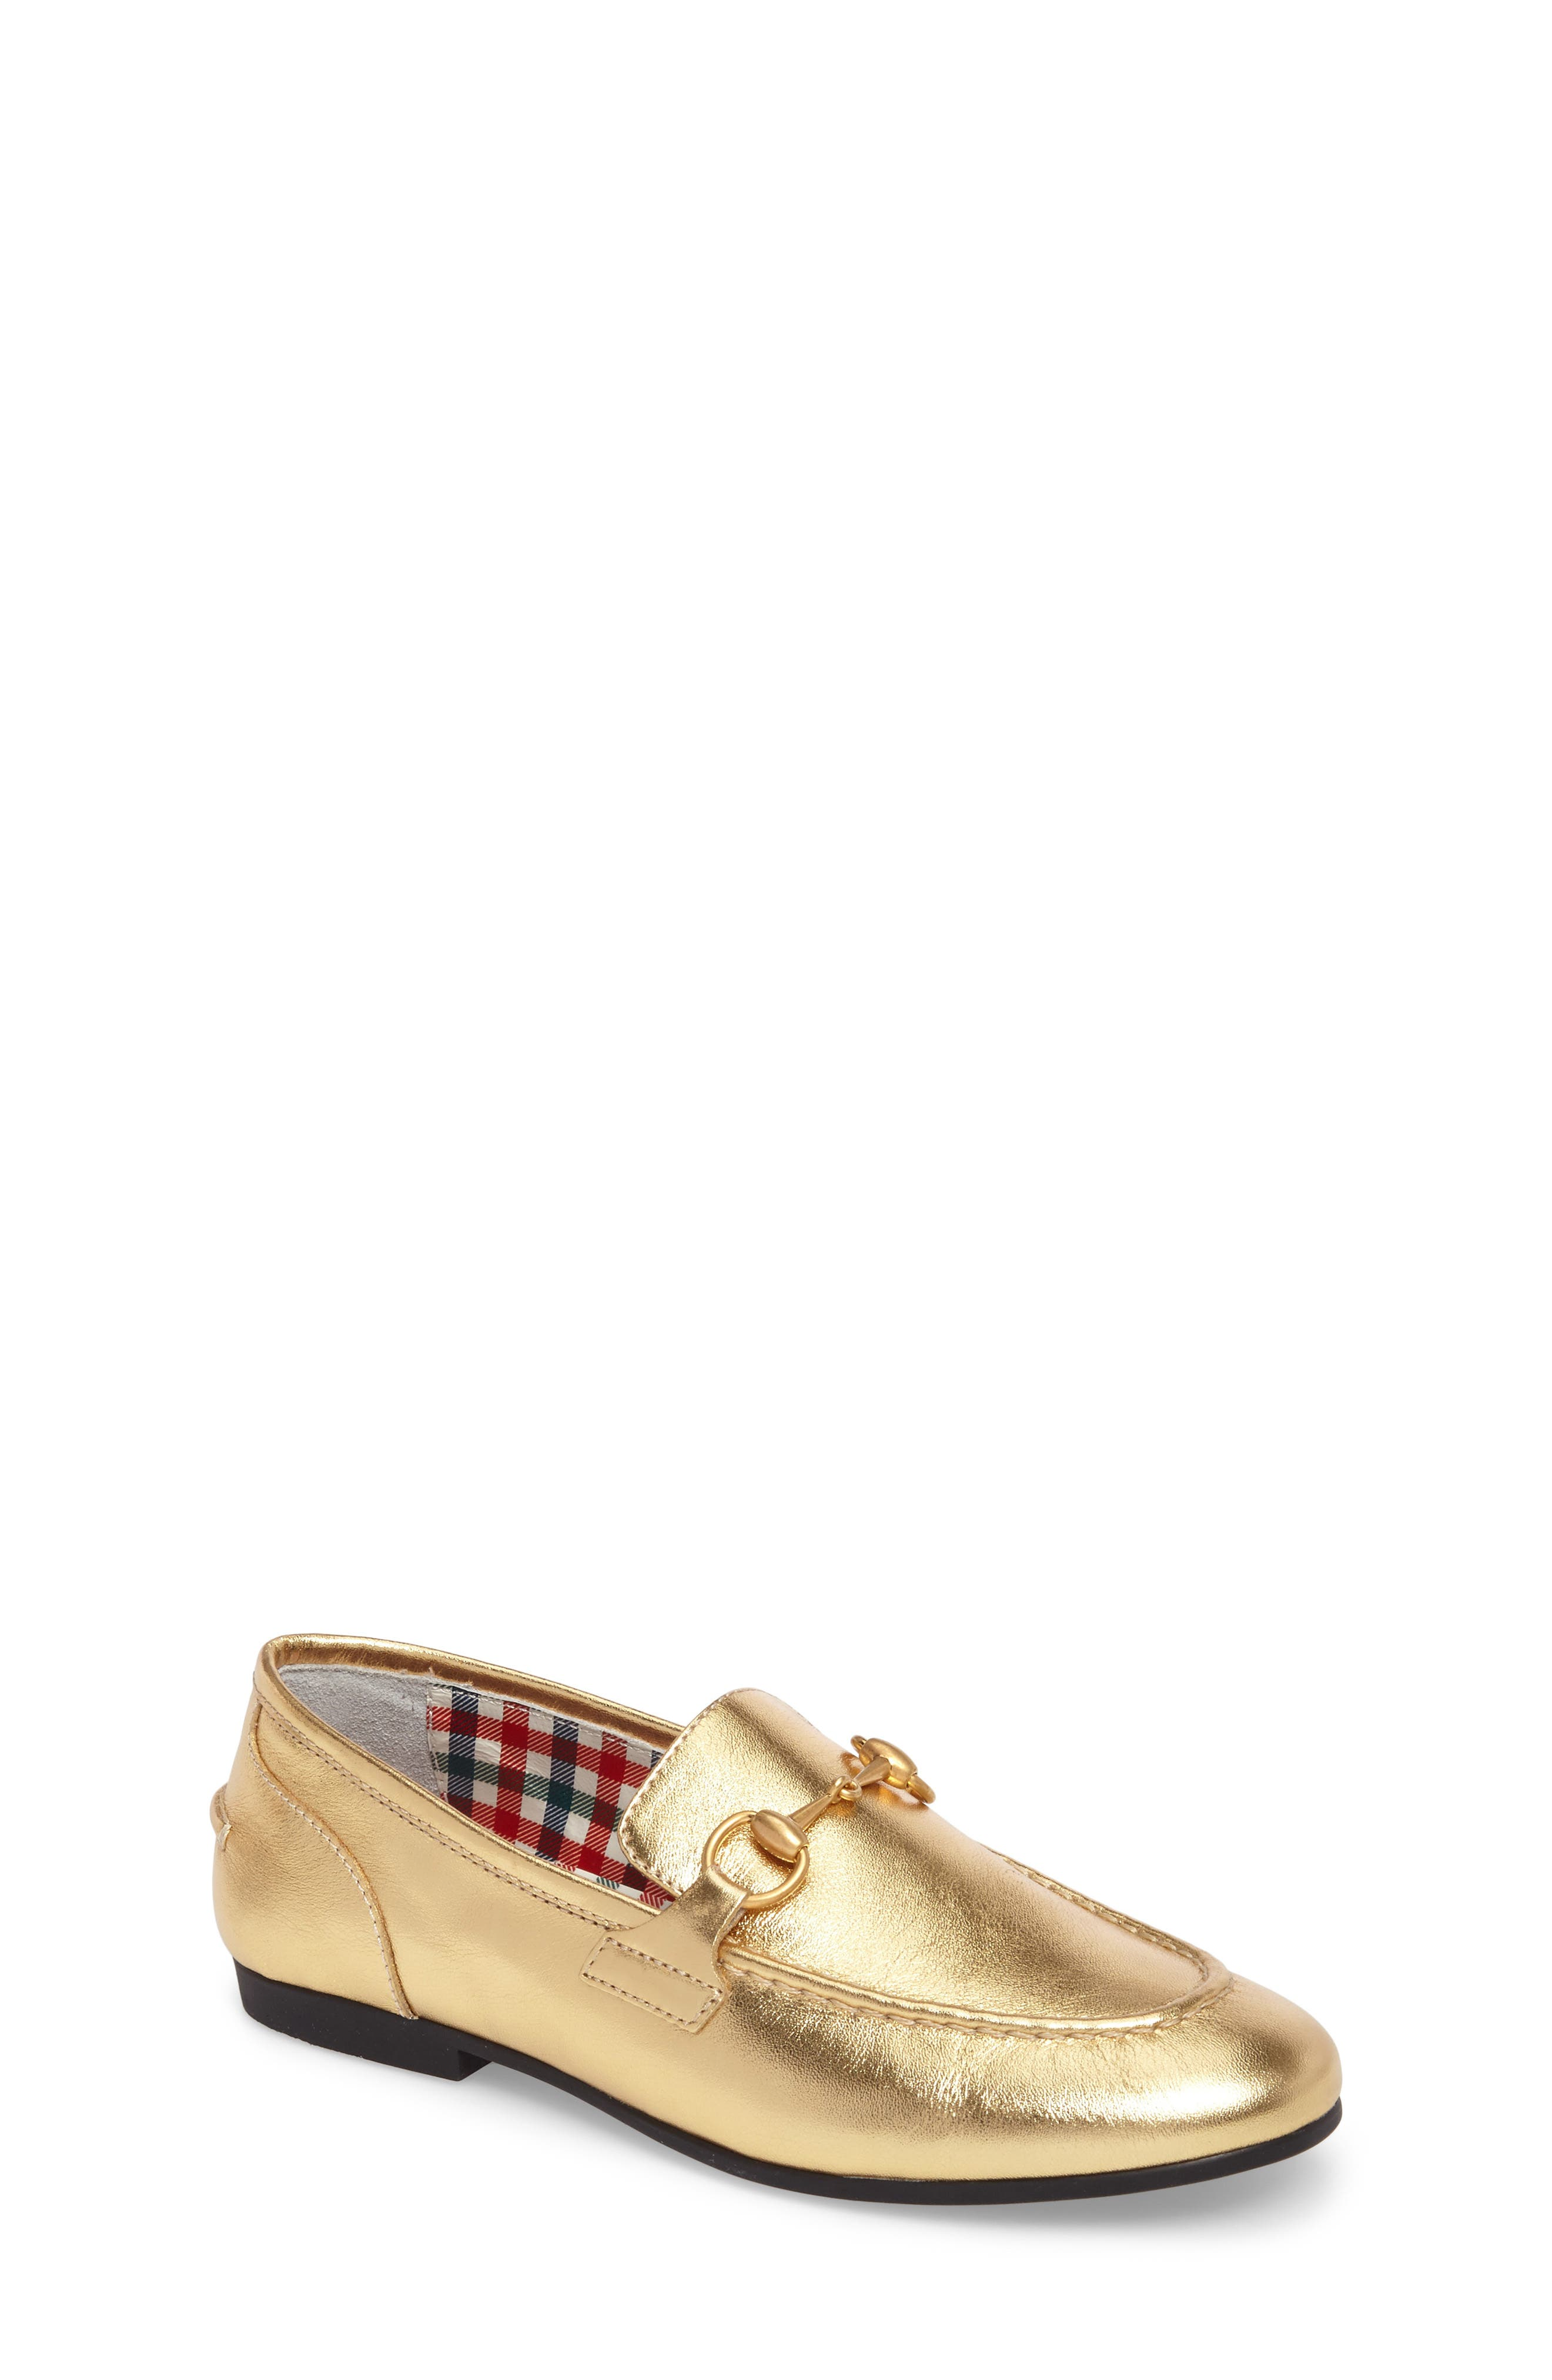 Jordaan Bit Loafer,                         Main,                         color, METALLIC GOLD